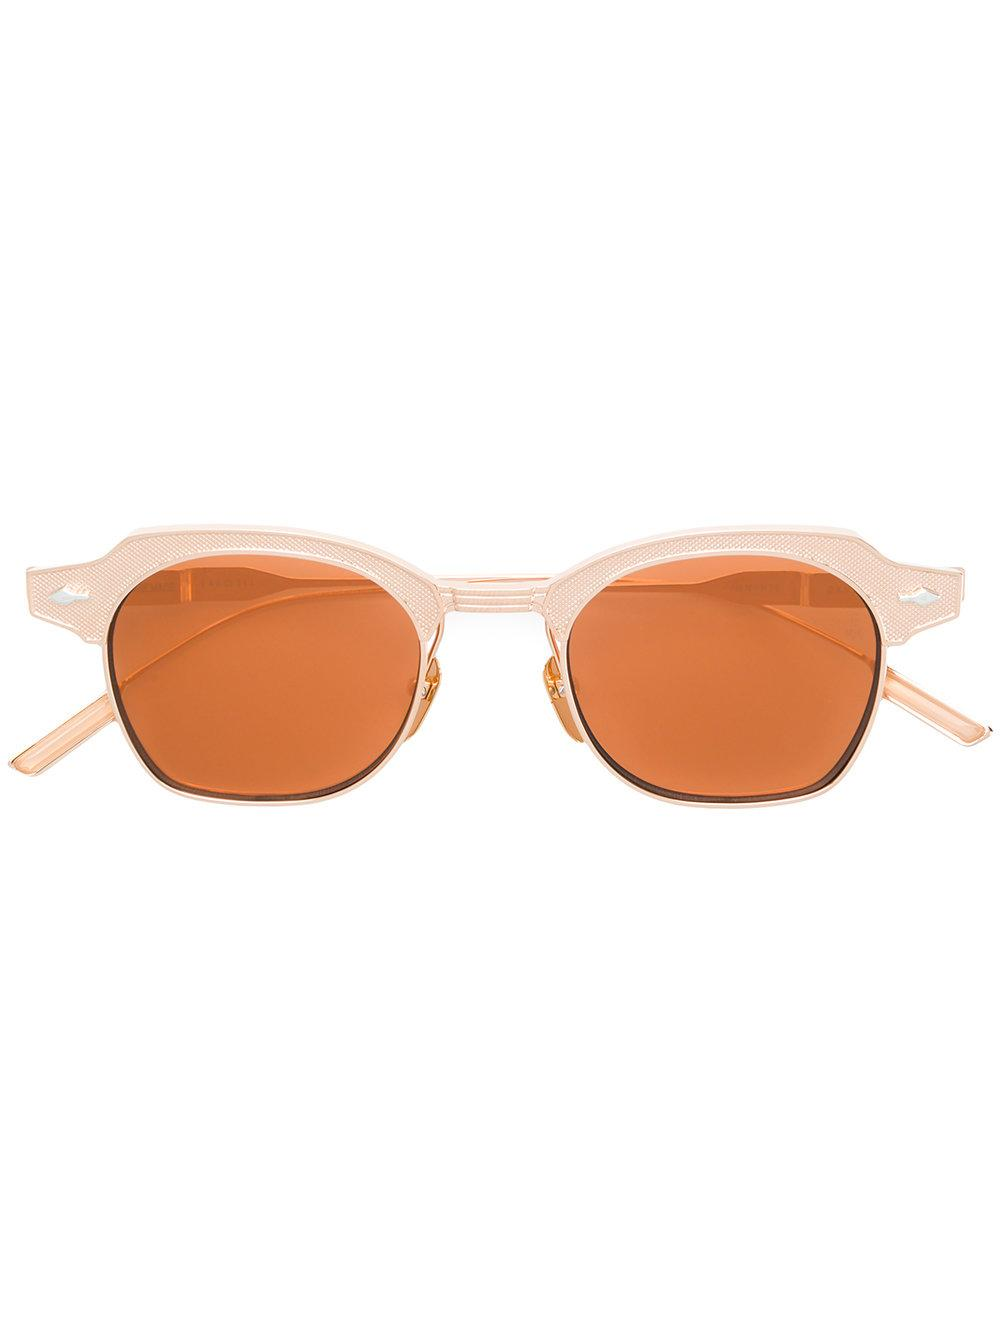 Jacques Marie Mage Dausmenil Square Frame Sunglasses In Metallic